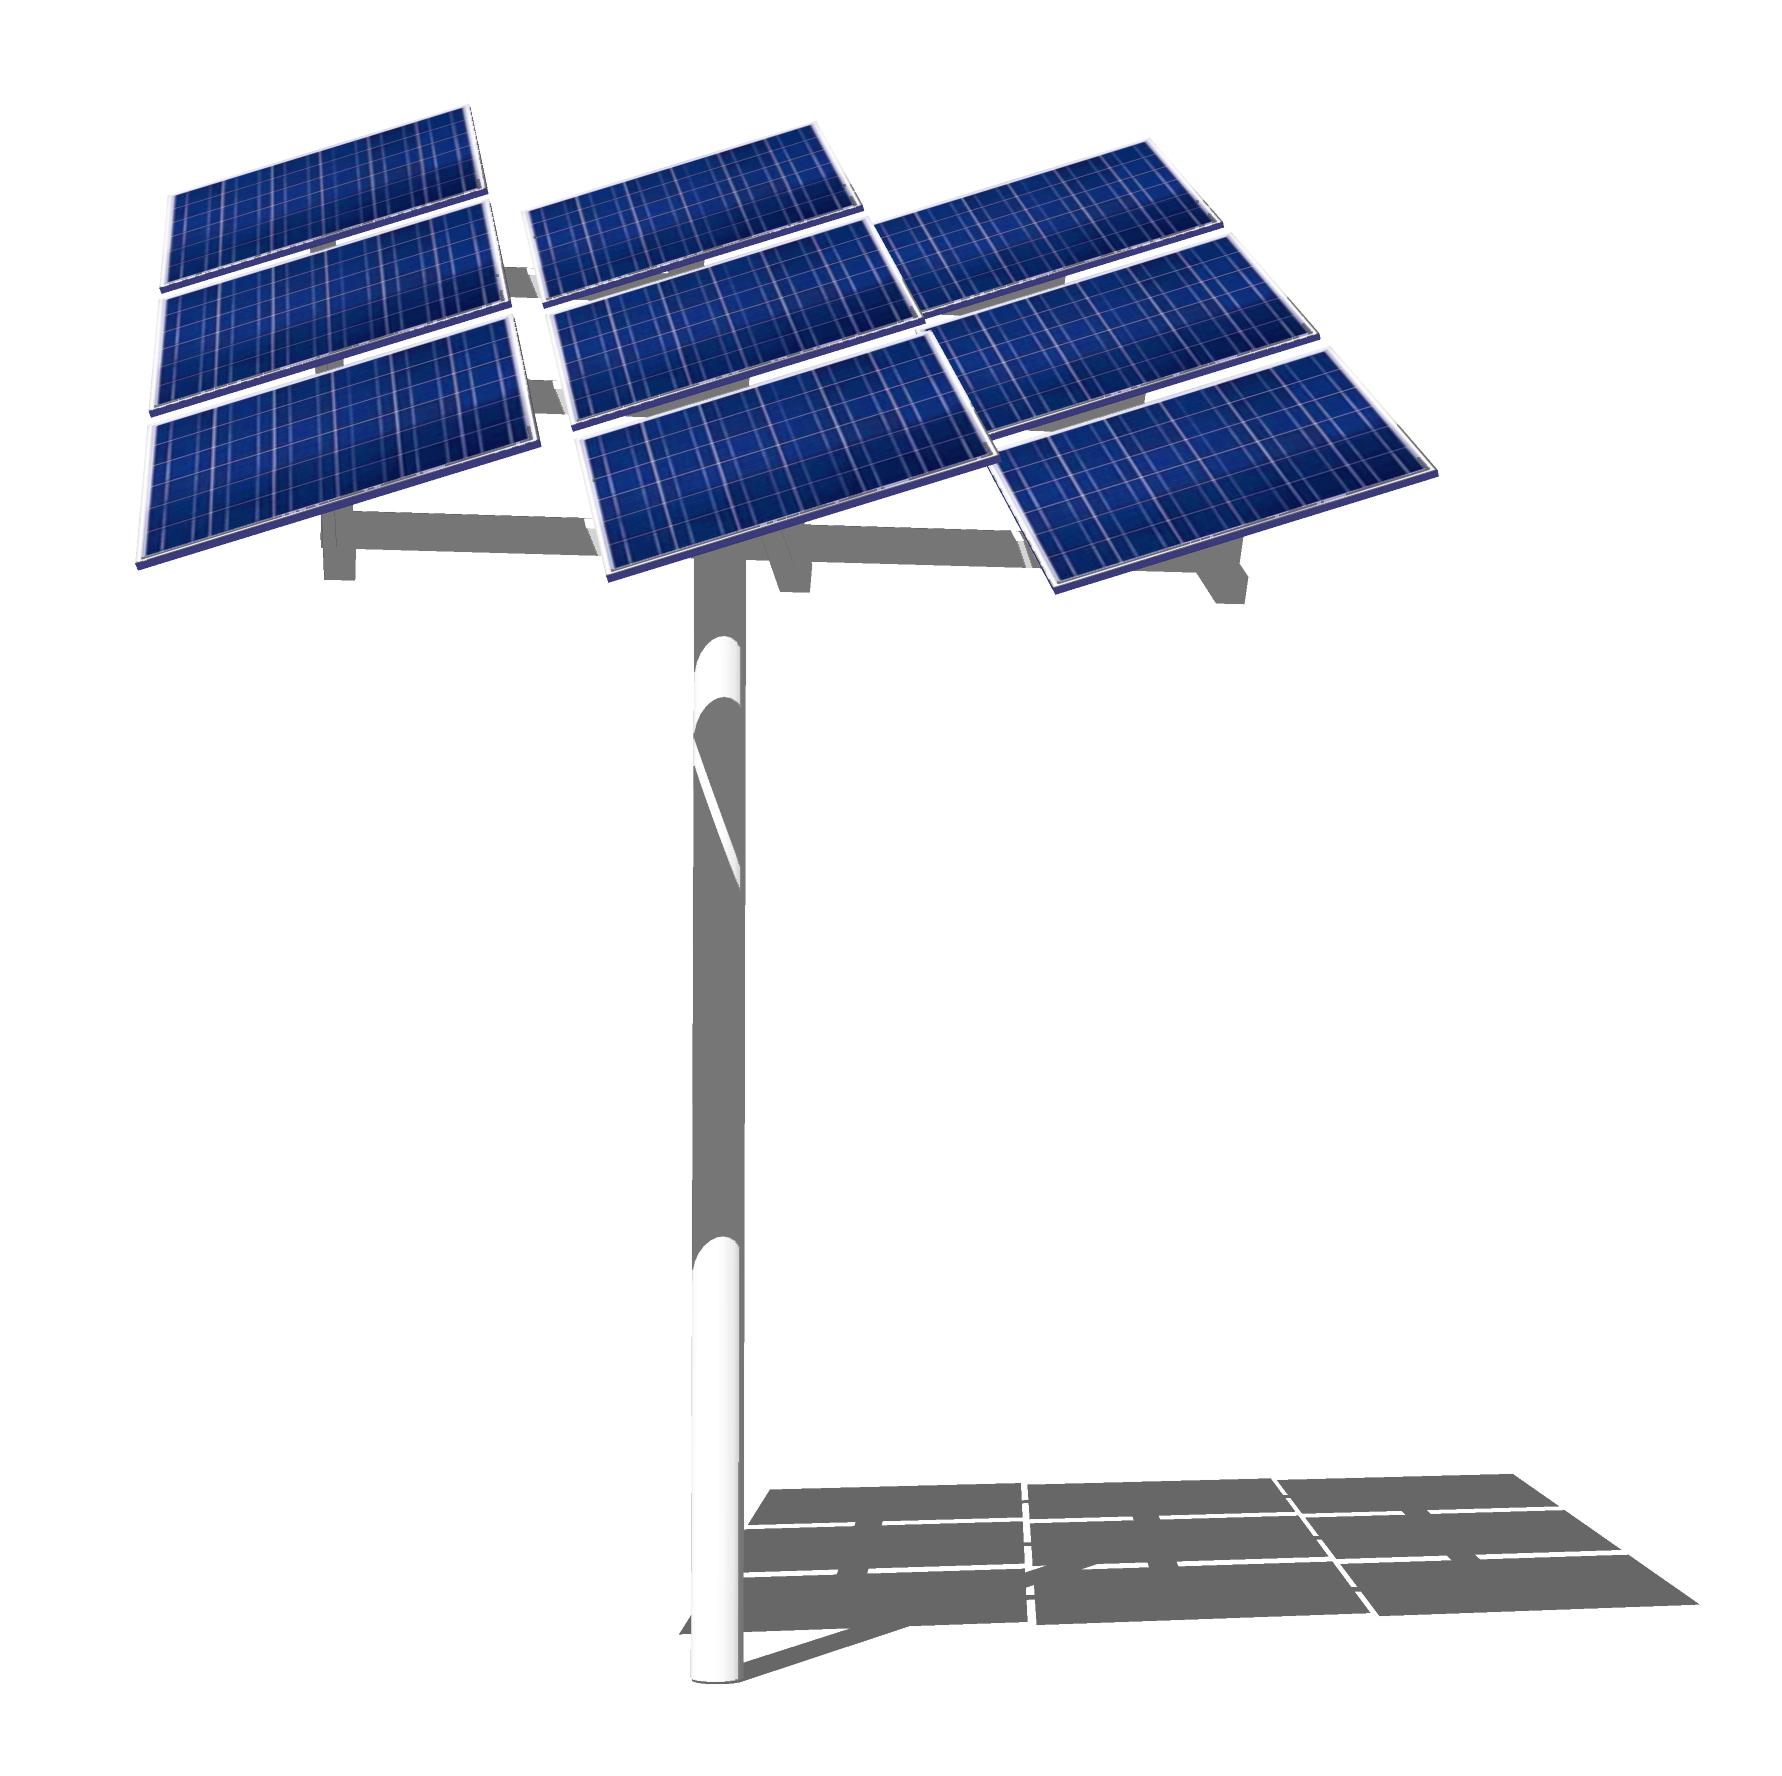 ranger spacecraft solar panels - photo #39